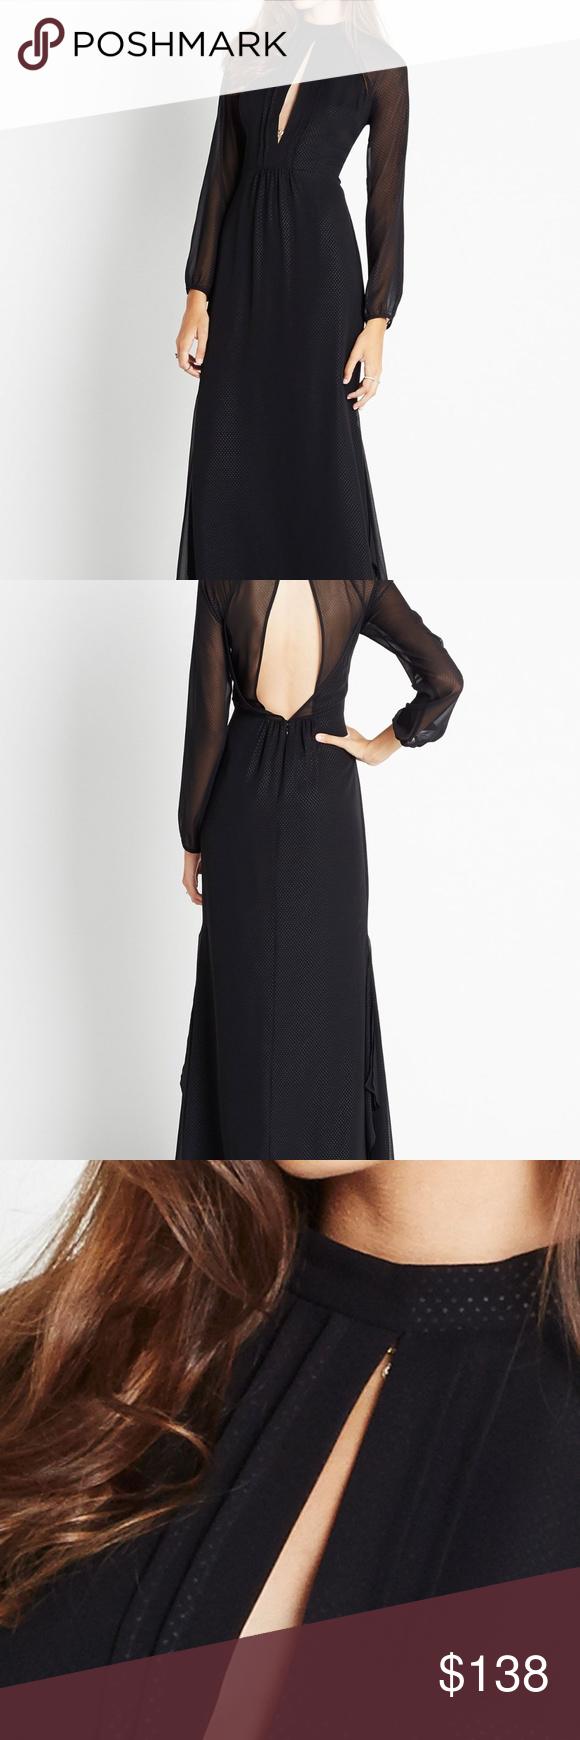 Final price dropuc new bcbg mock dress nwt bcbg dresses and